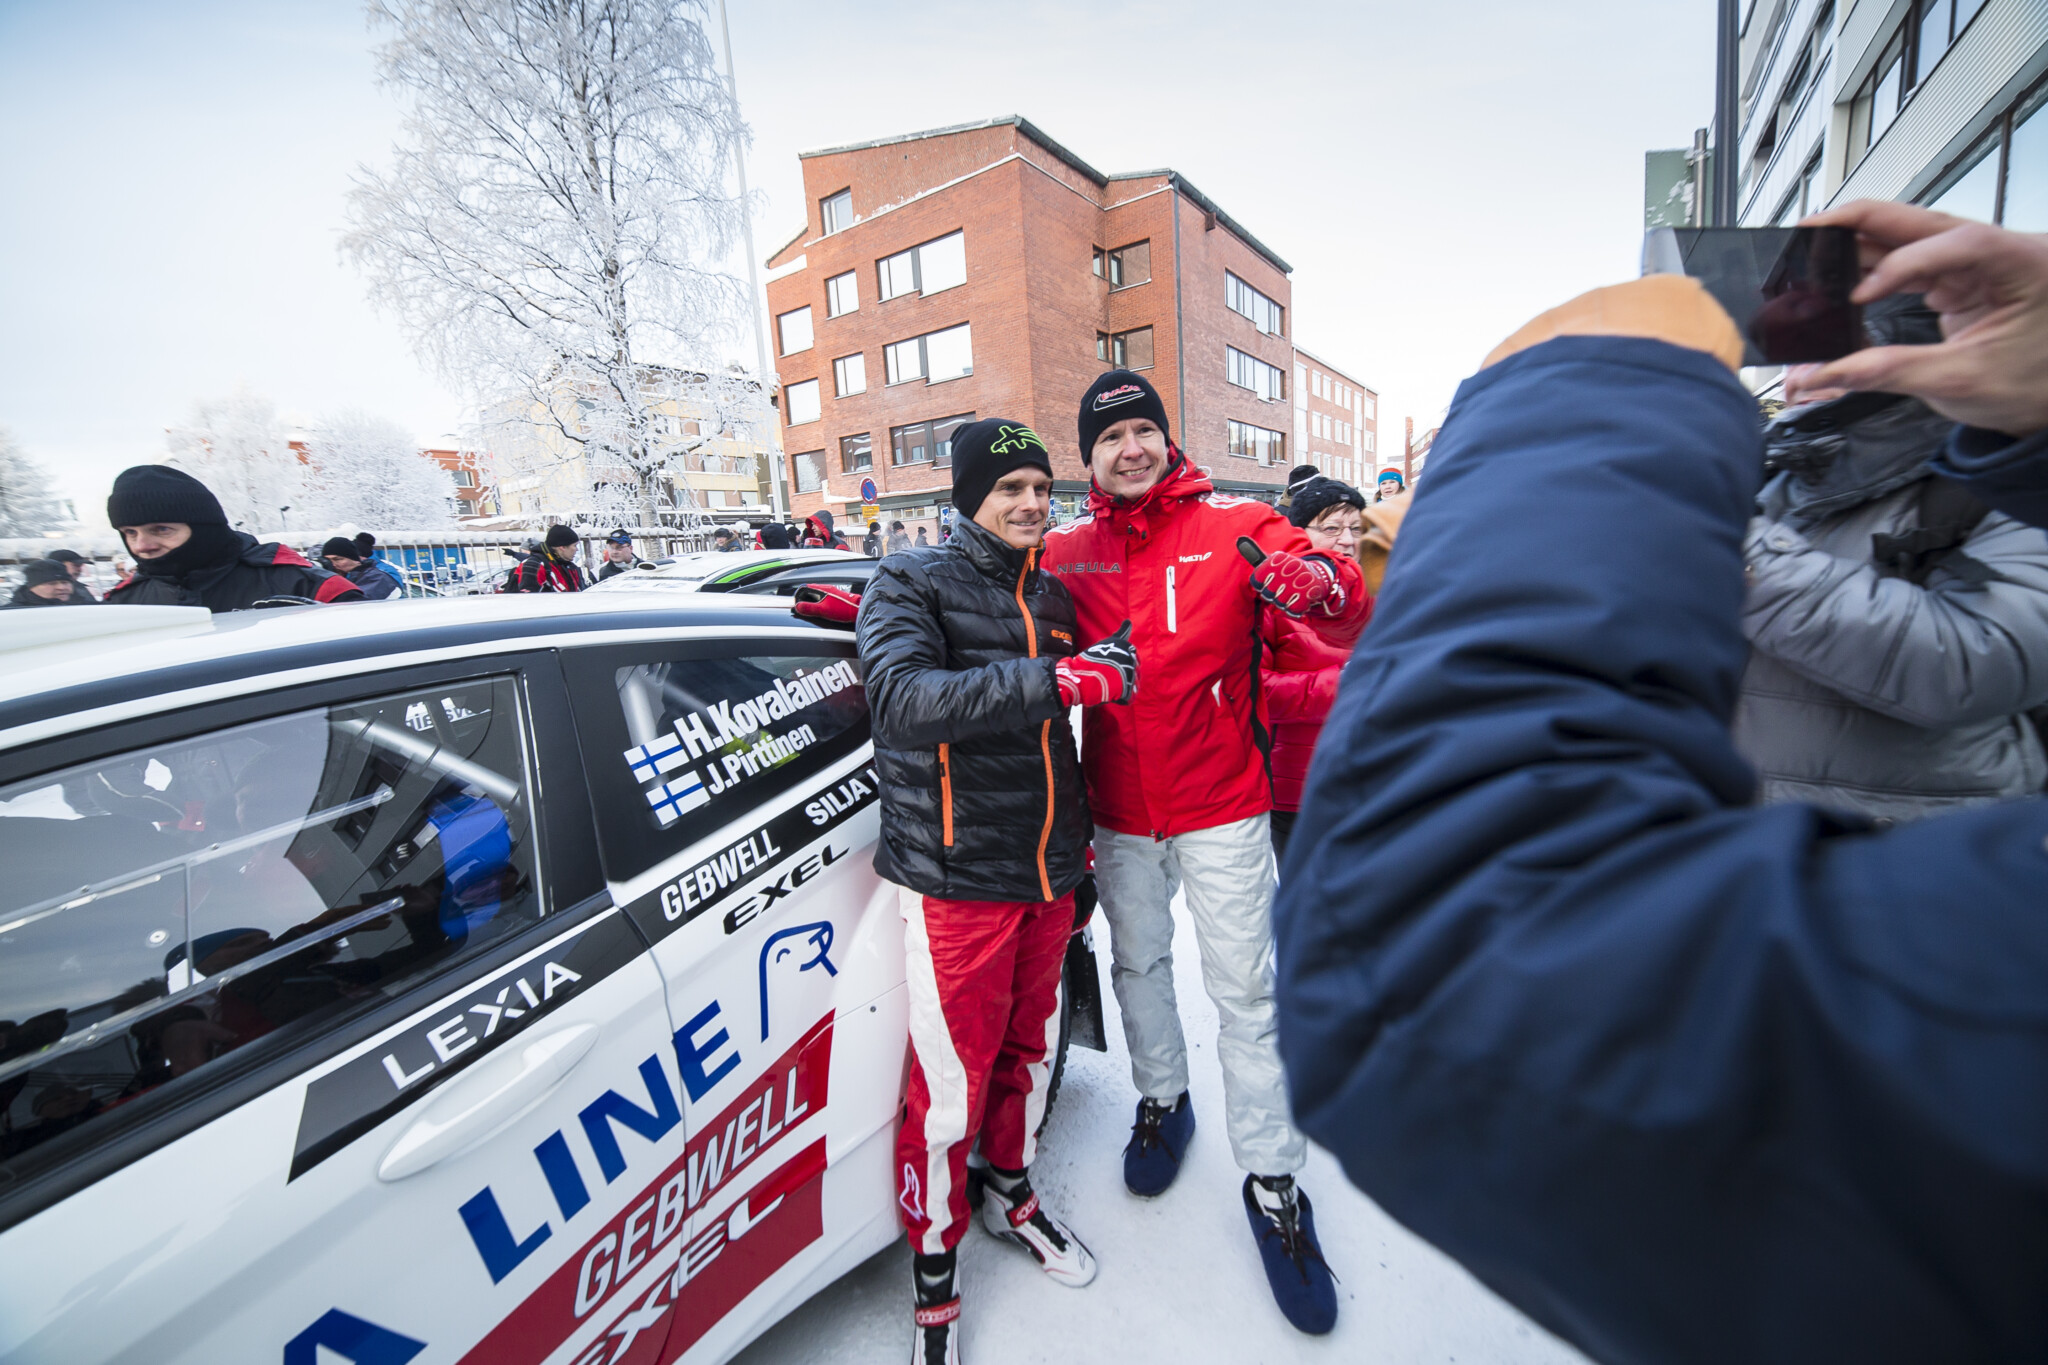 Arctic Lapland Rally 2015 in Rovaniemi Lapland Finland (8)